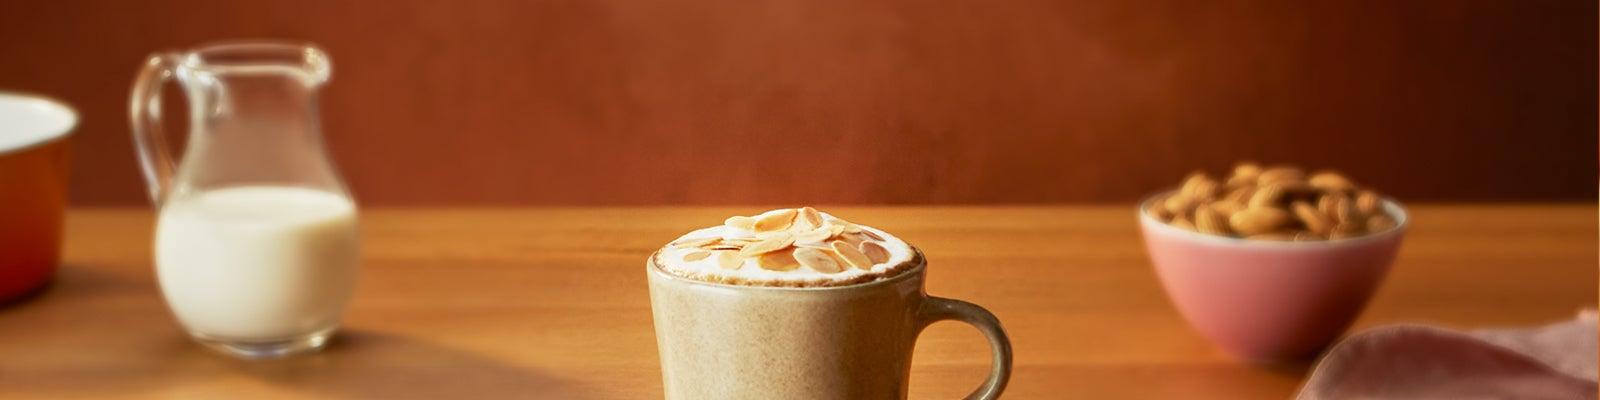 Roasted Almond Recipe Header